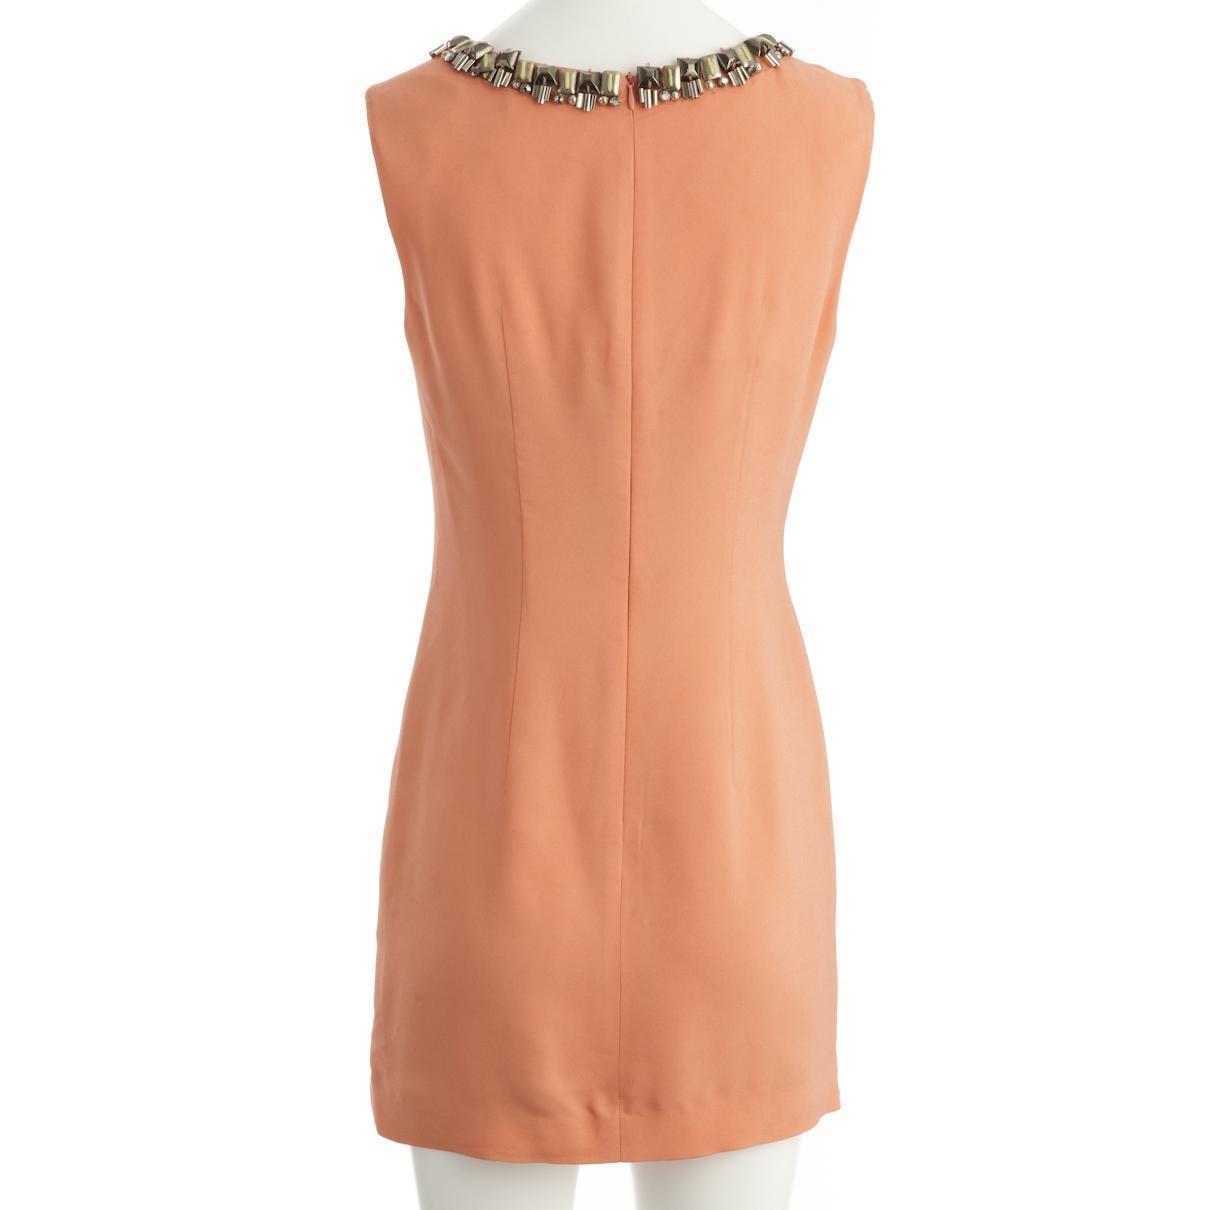 4fdd7e3330 Matthew Williamson - Pre-owned Orange Viscose Dresses - Lyst. View  fullscreen